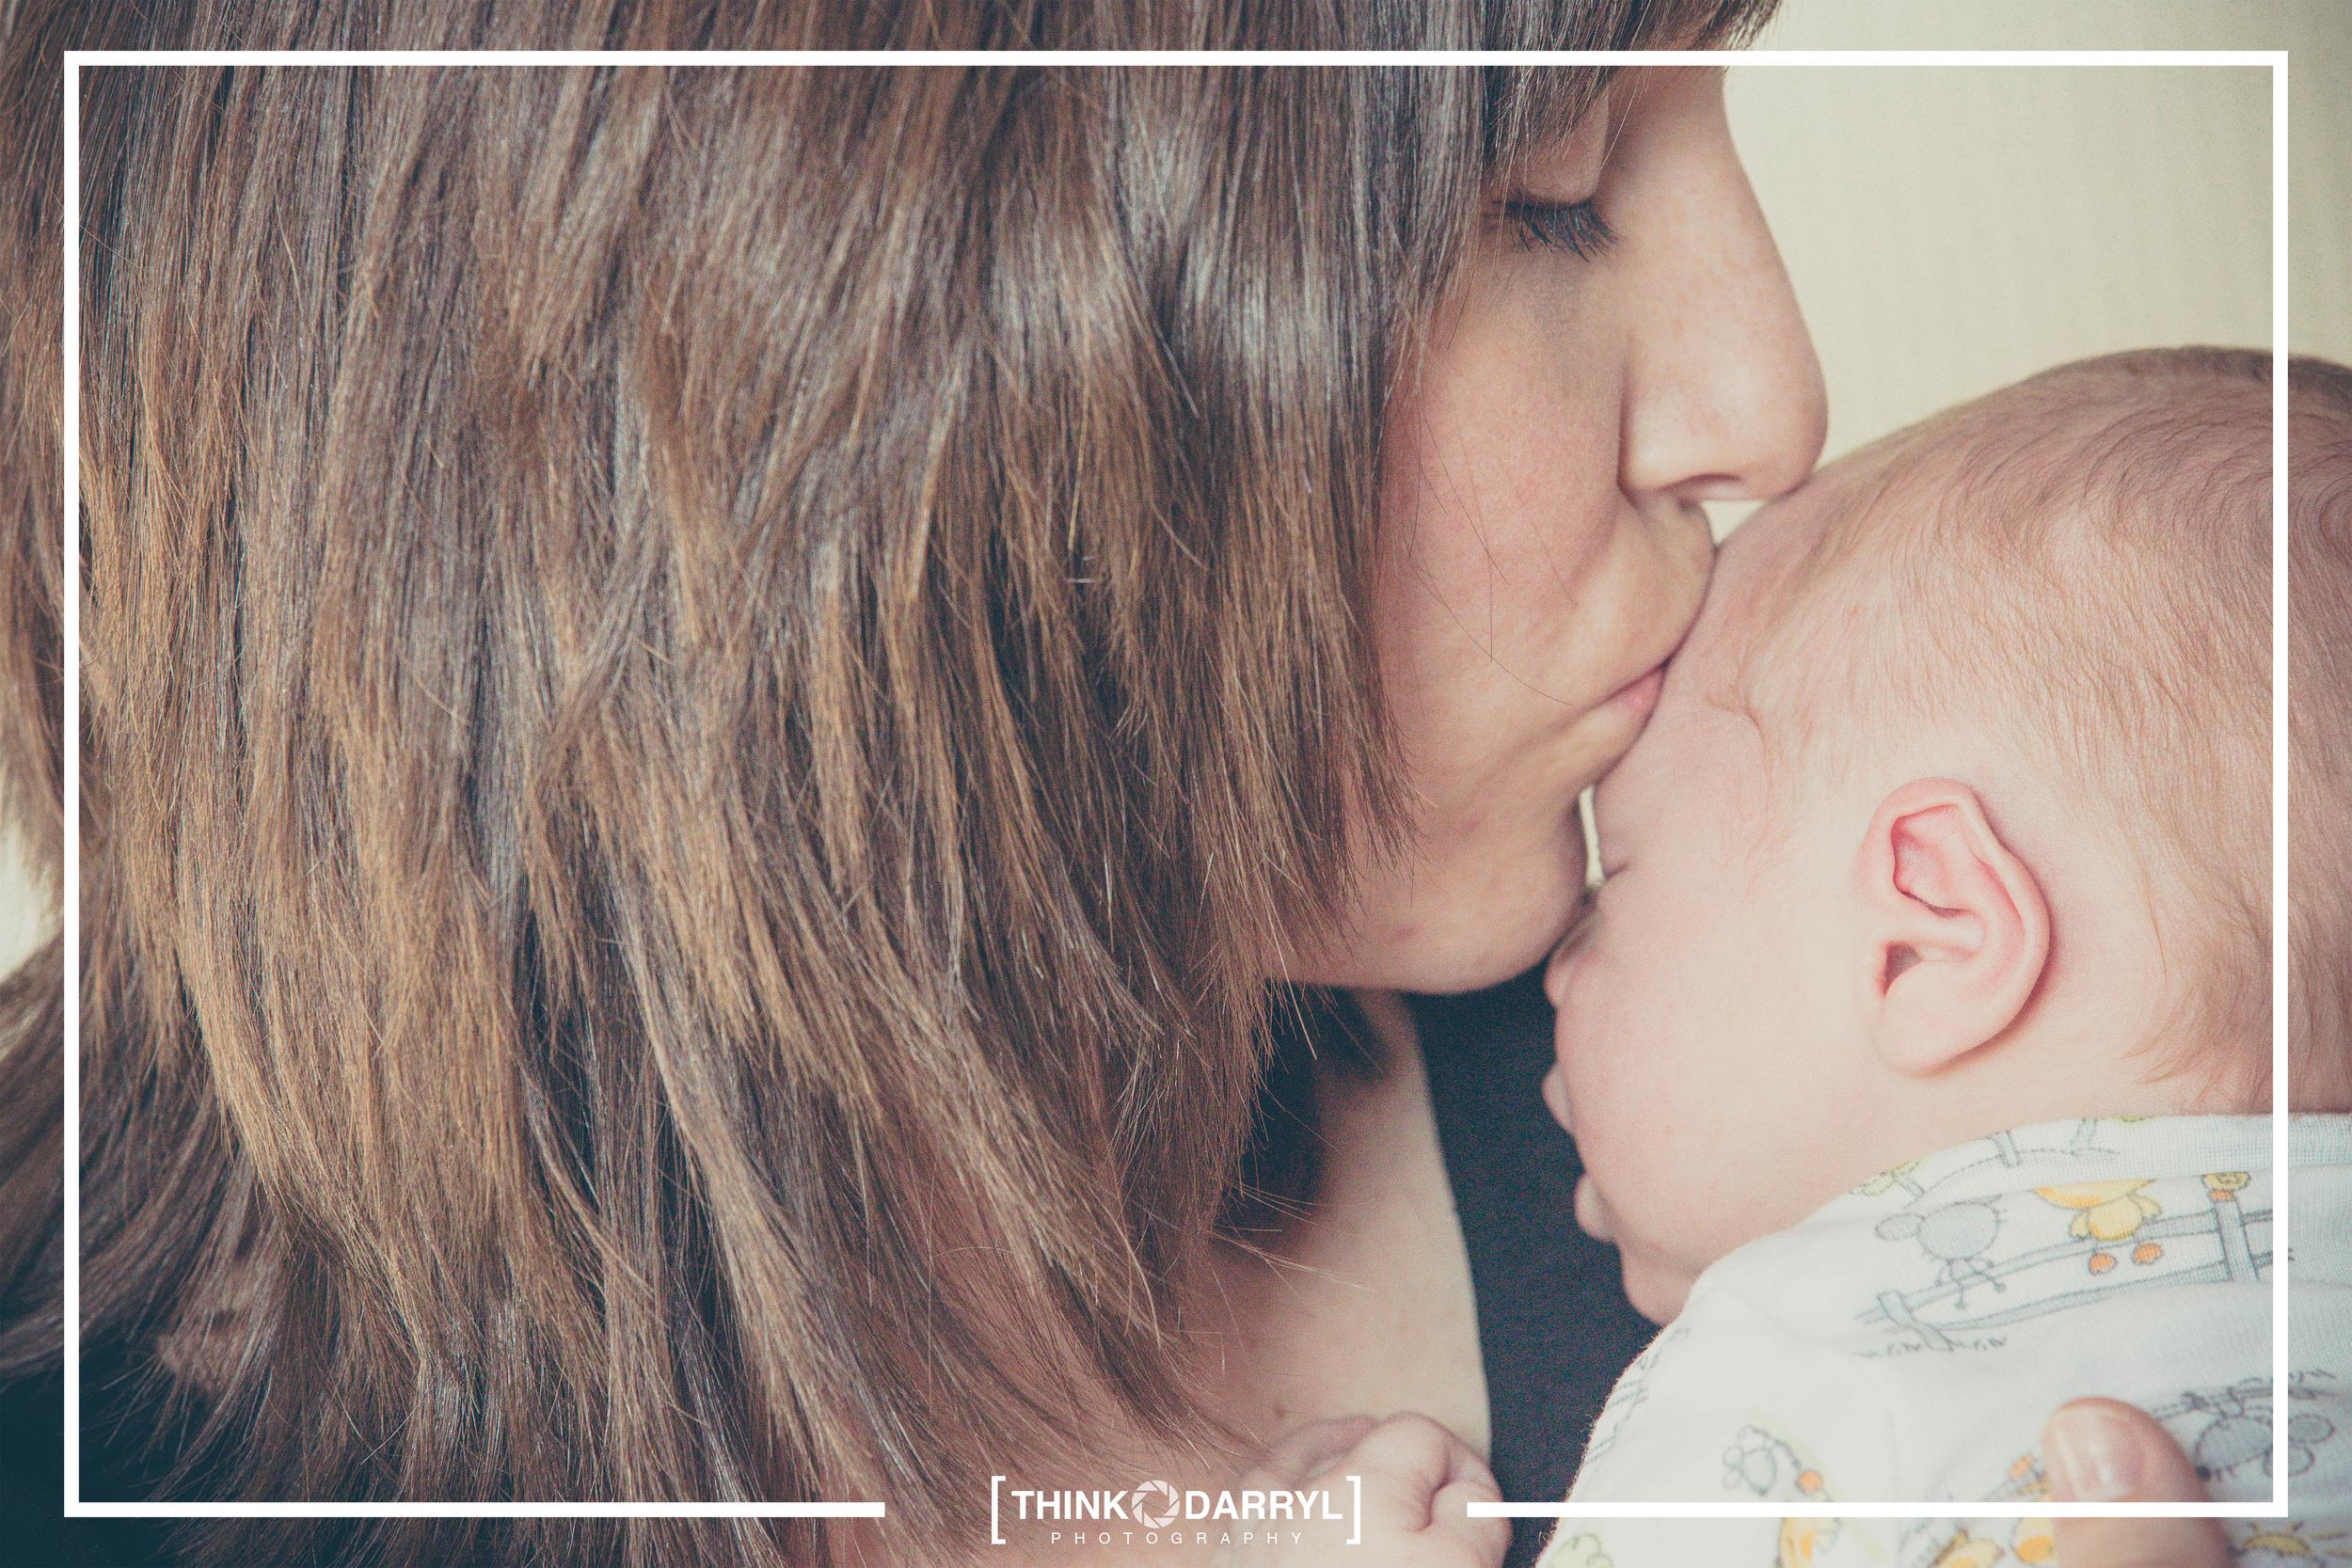 Evans Family | Think Darryl Photography - Denver Newborn Photographer